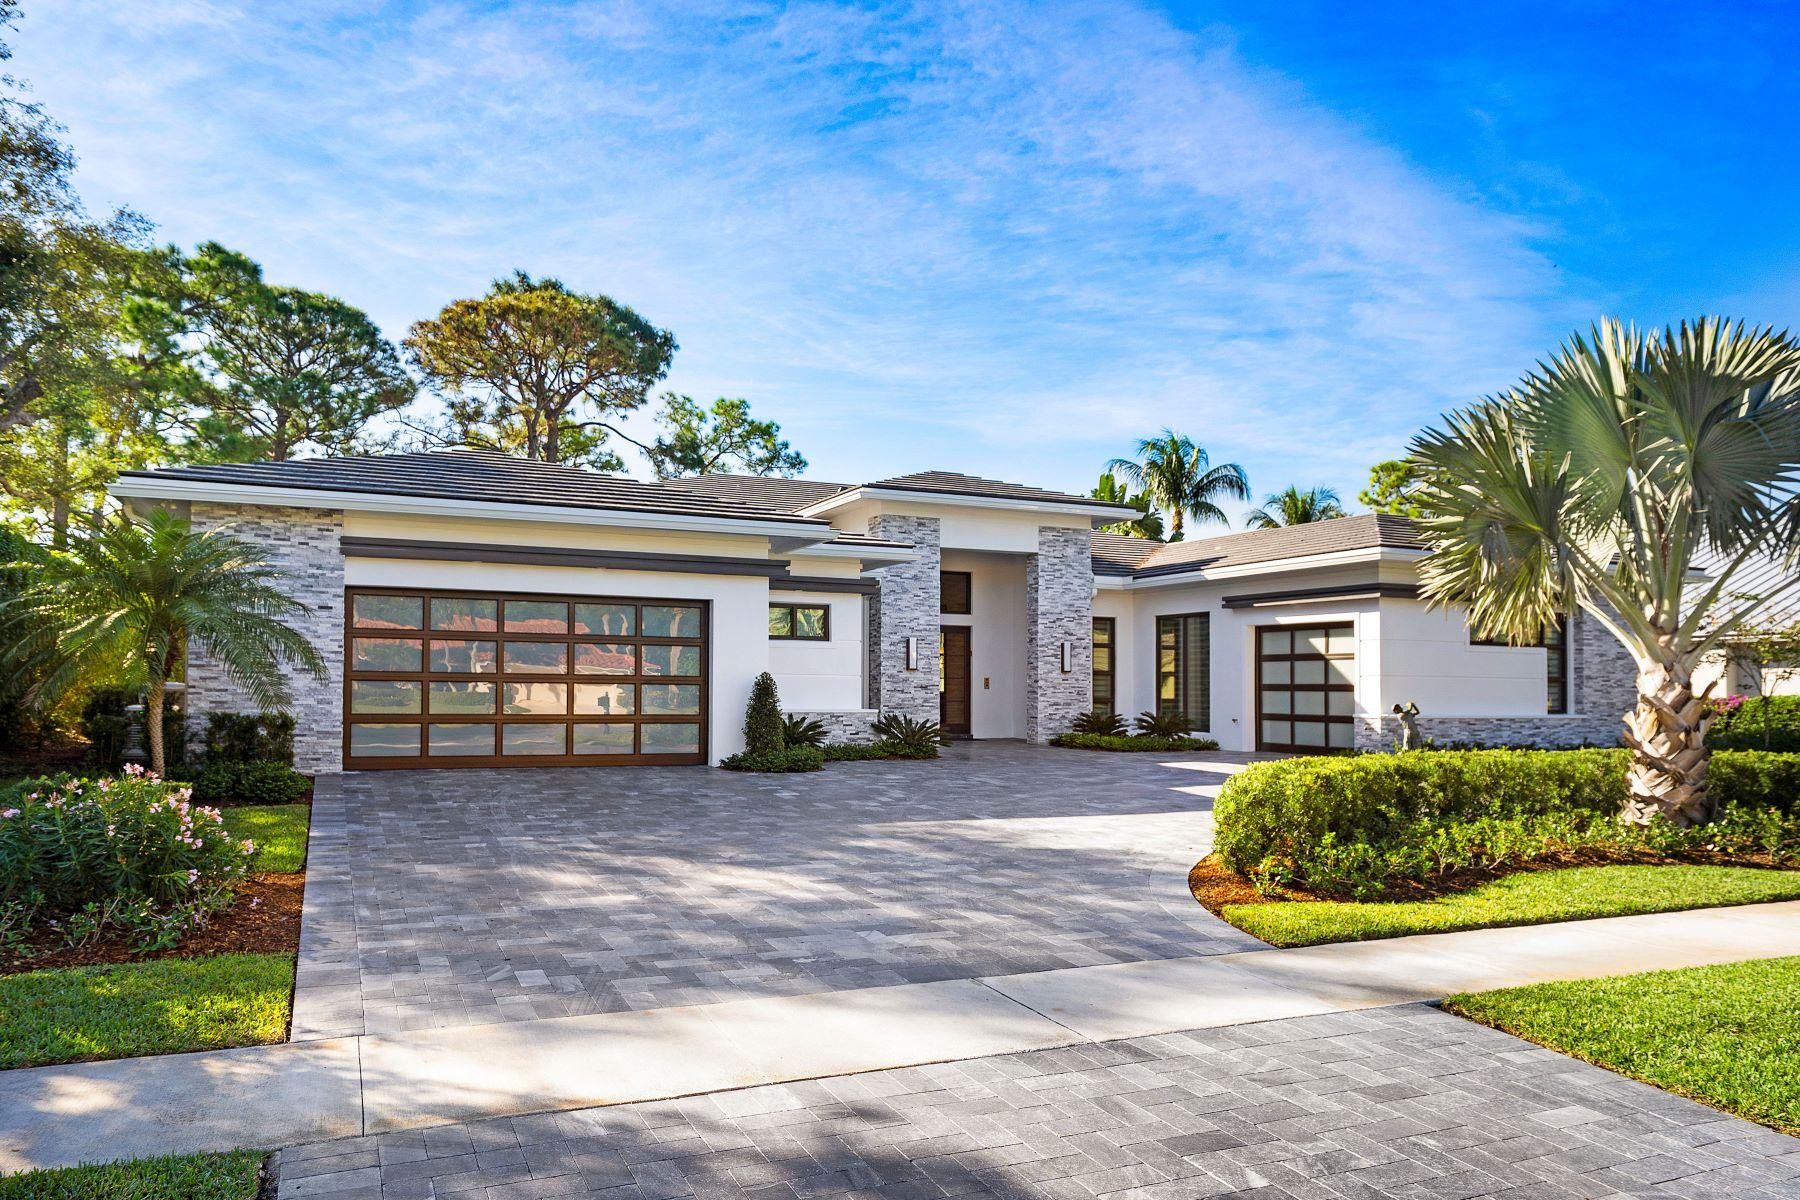 Additional photo for property listing at 9237 Orchid Cove Circle Vero Beach, Florida 32963 Estados Unidos